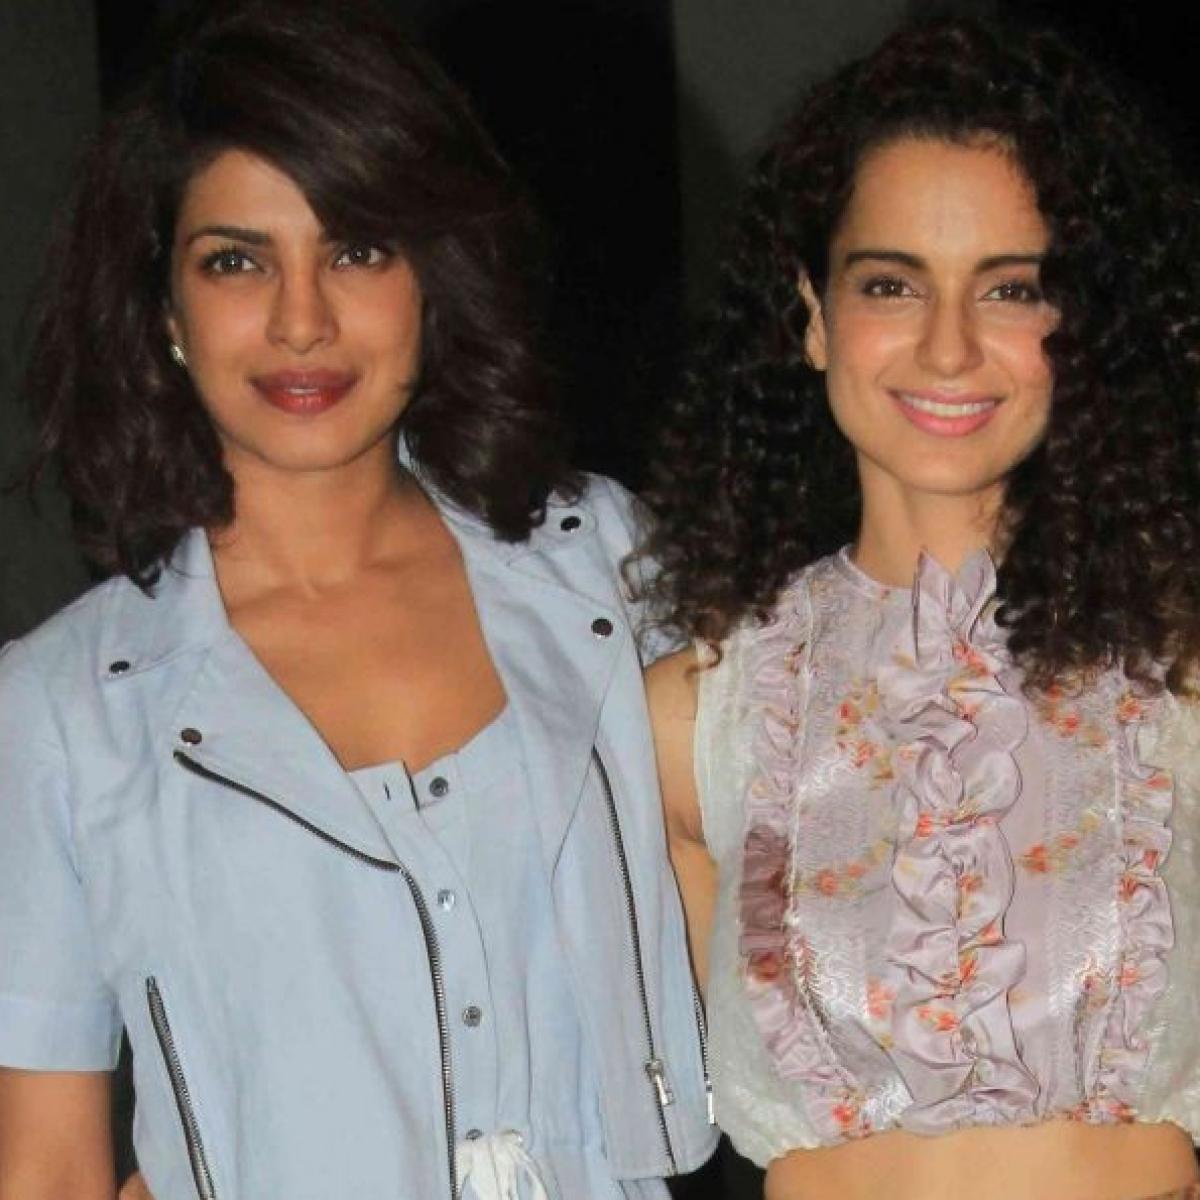 Kangana Ranaut accuses 'Fashion' co-star Priyanka Chopra of provoking farmers to incite violence